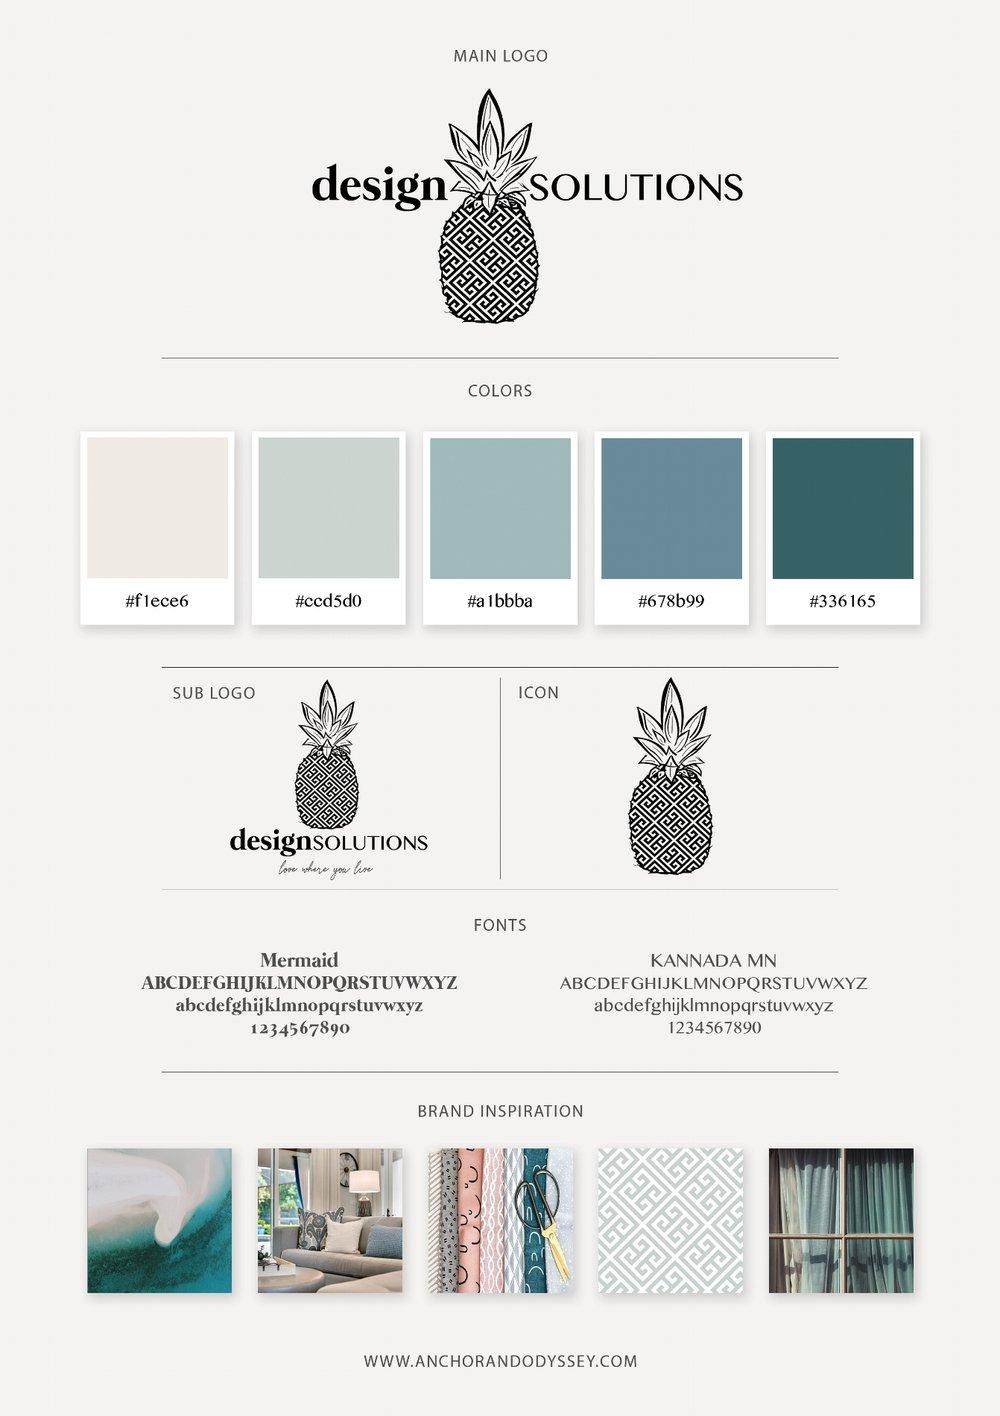 Design Solutions Branding Board.jpg